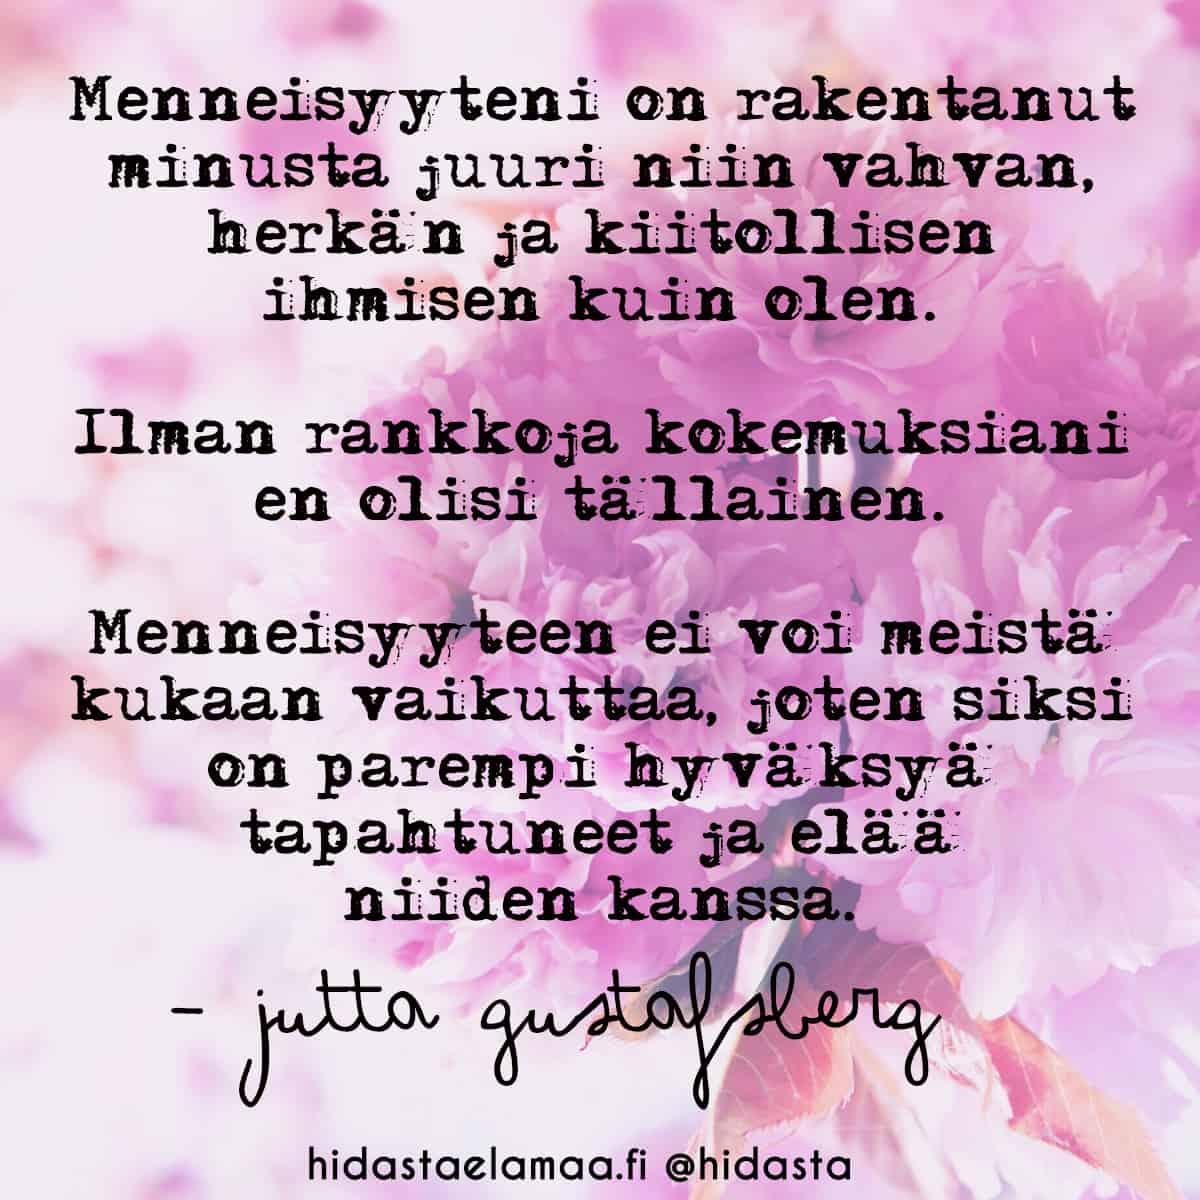 jutta1